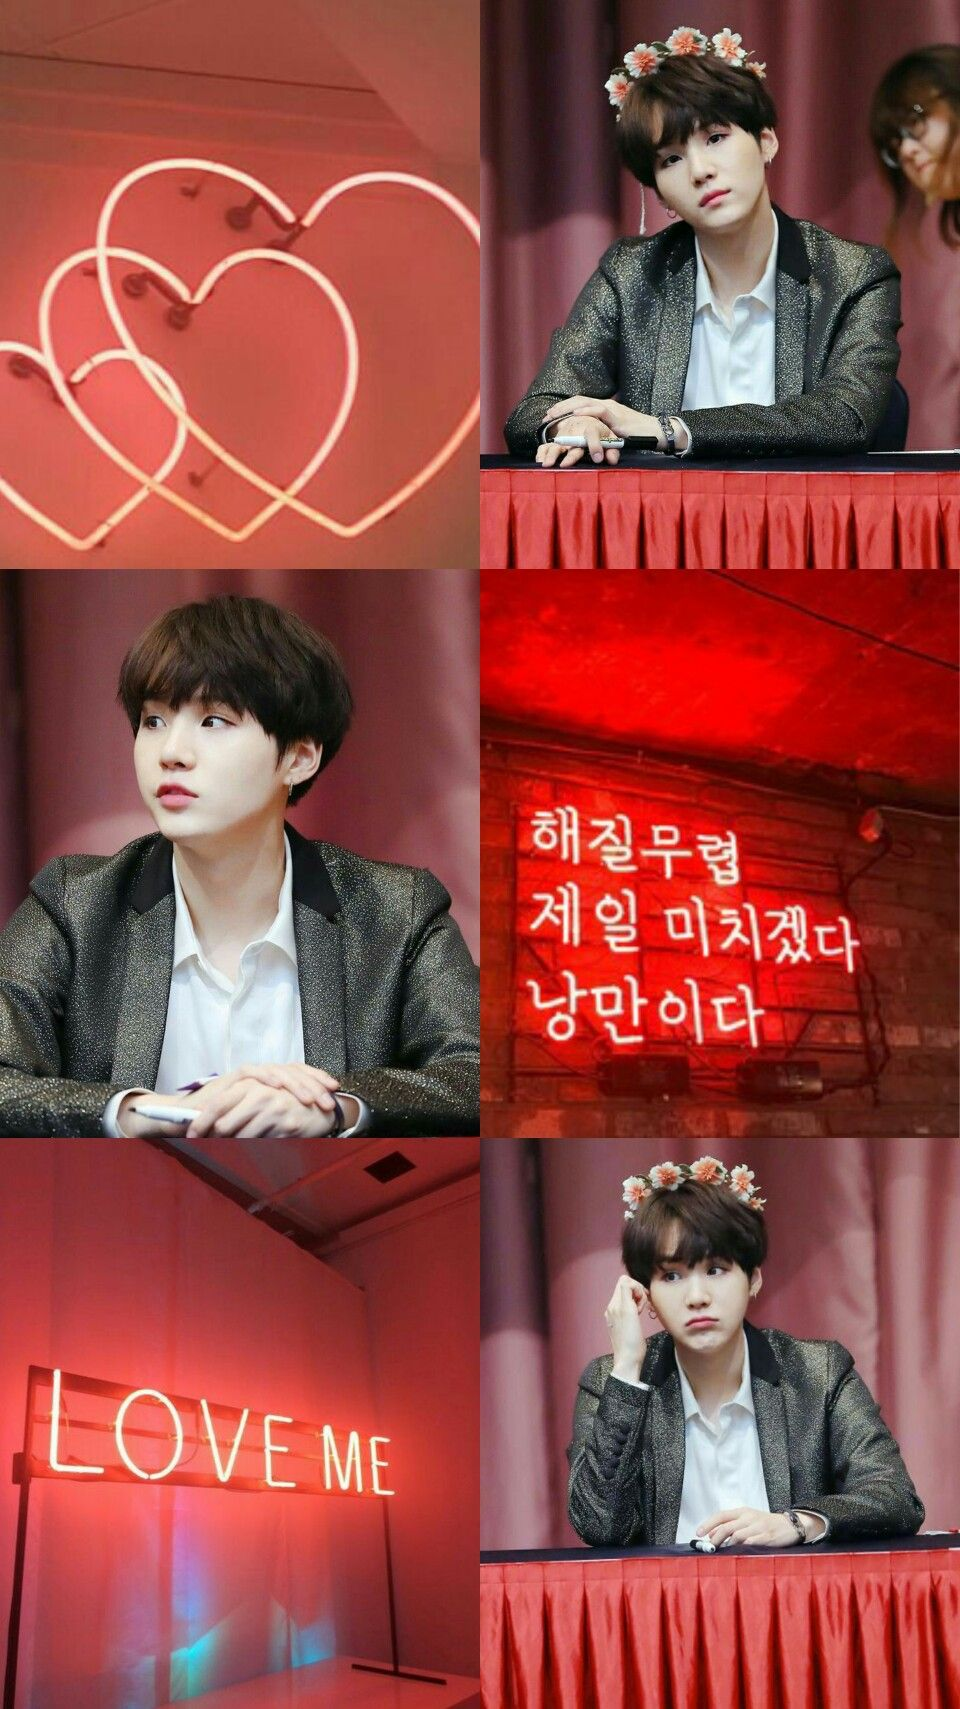 Min Yoongi Aesthetic Wallpaper Red Kpop 0 T Bts